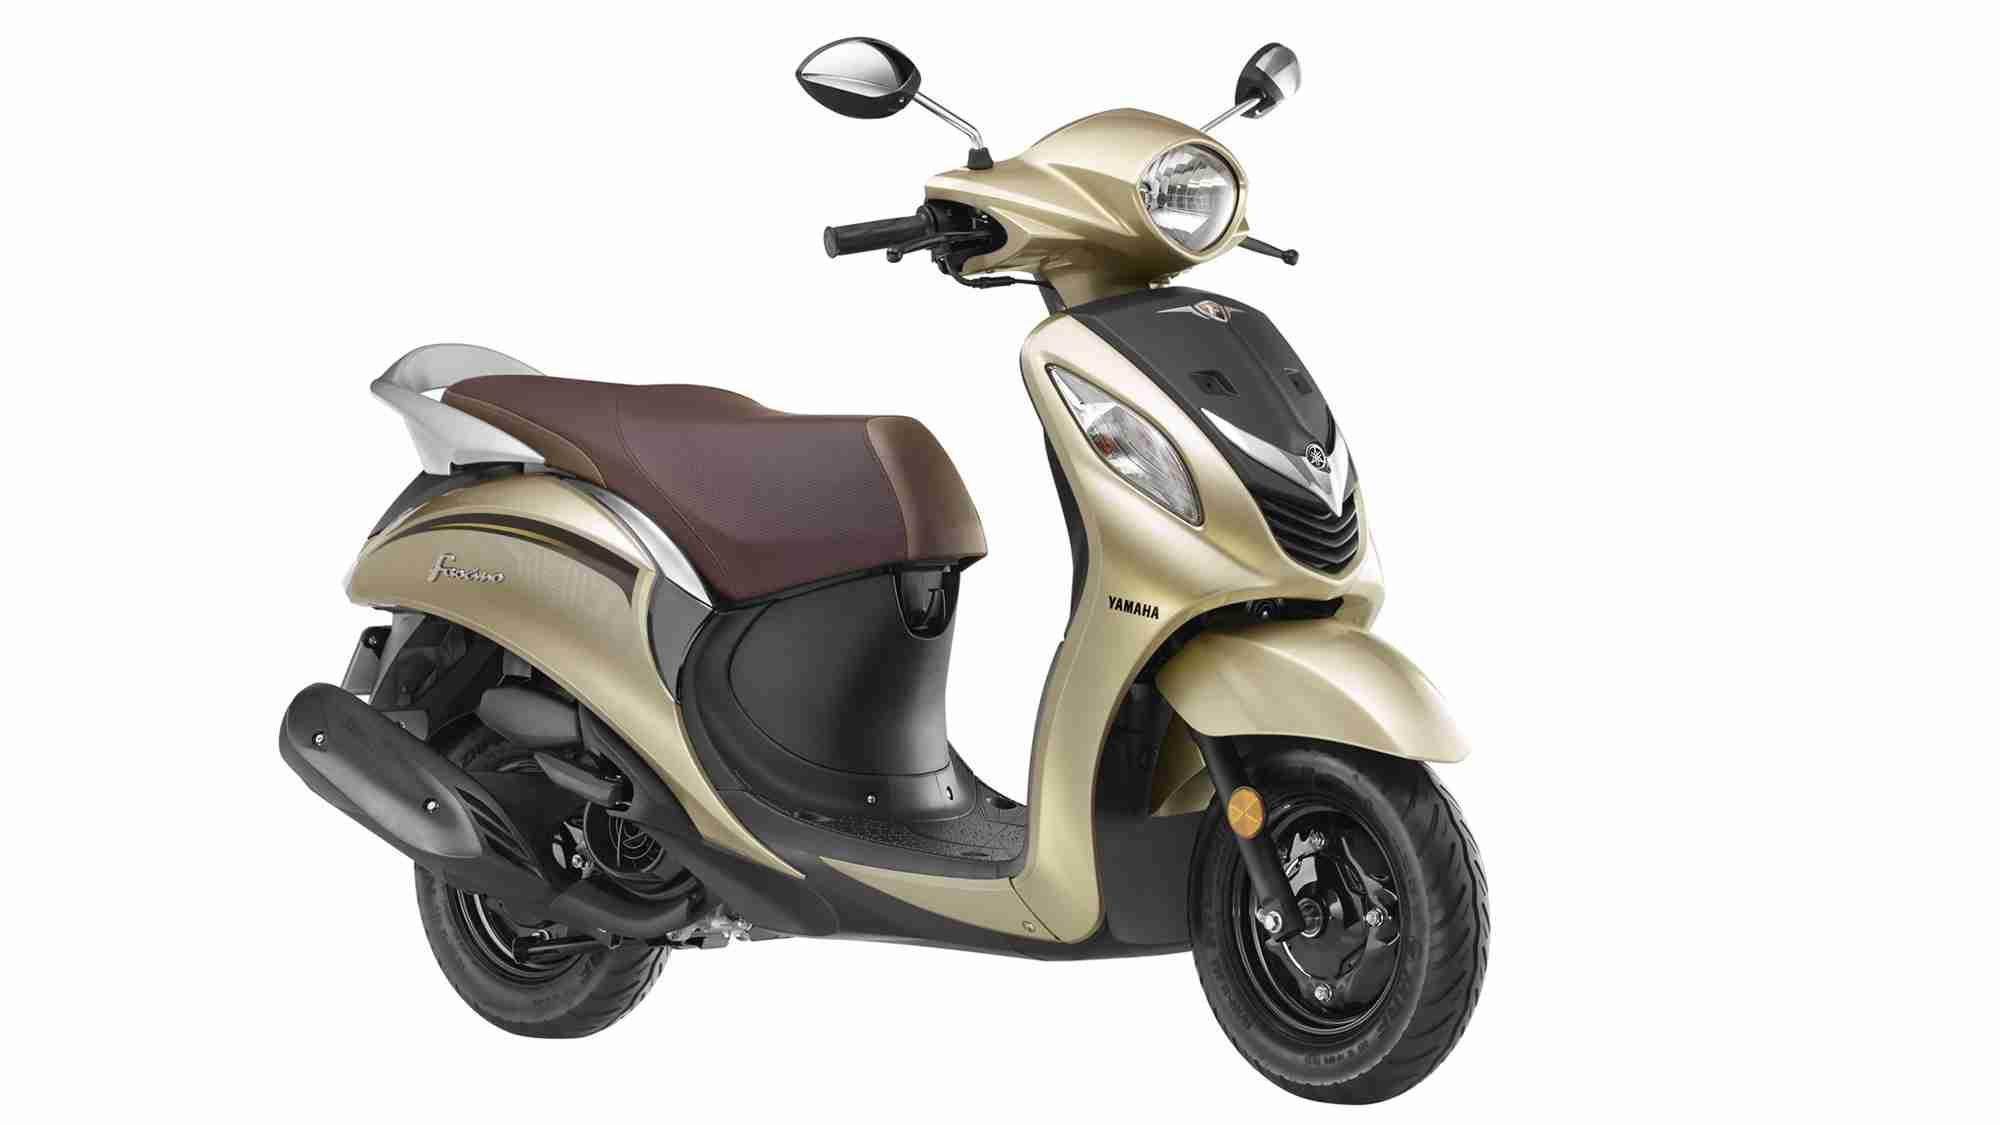 Yamaha Fascino gold colour option